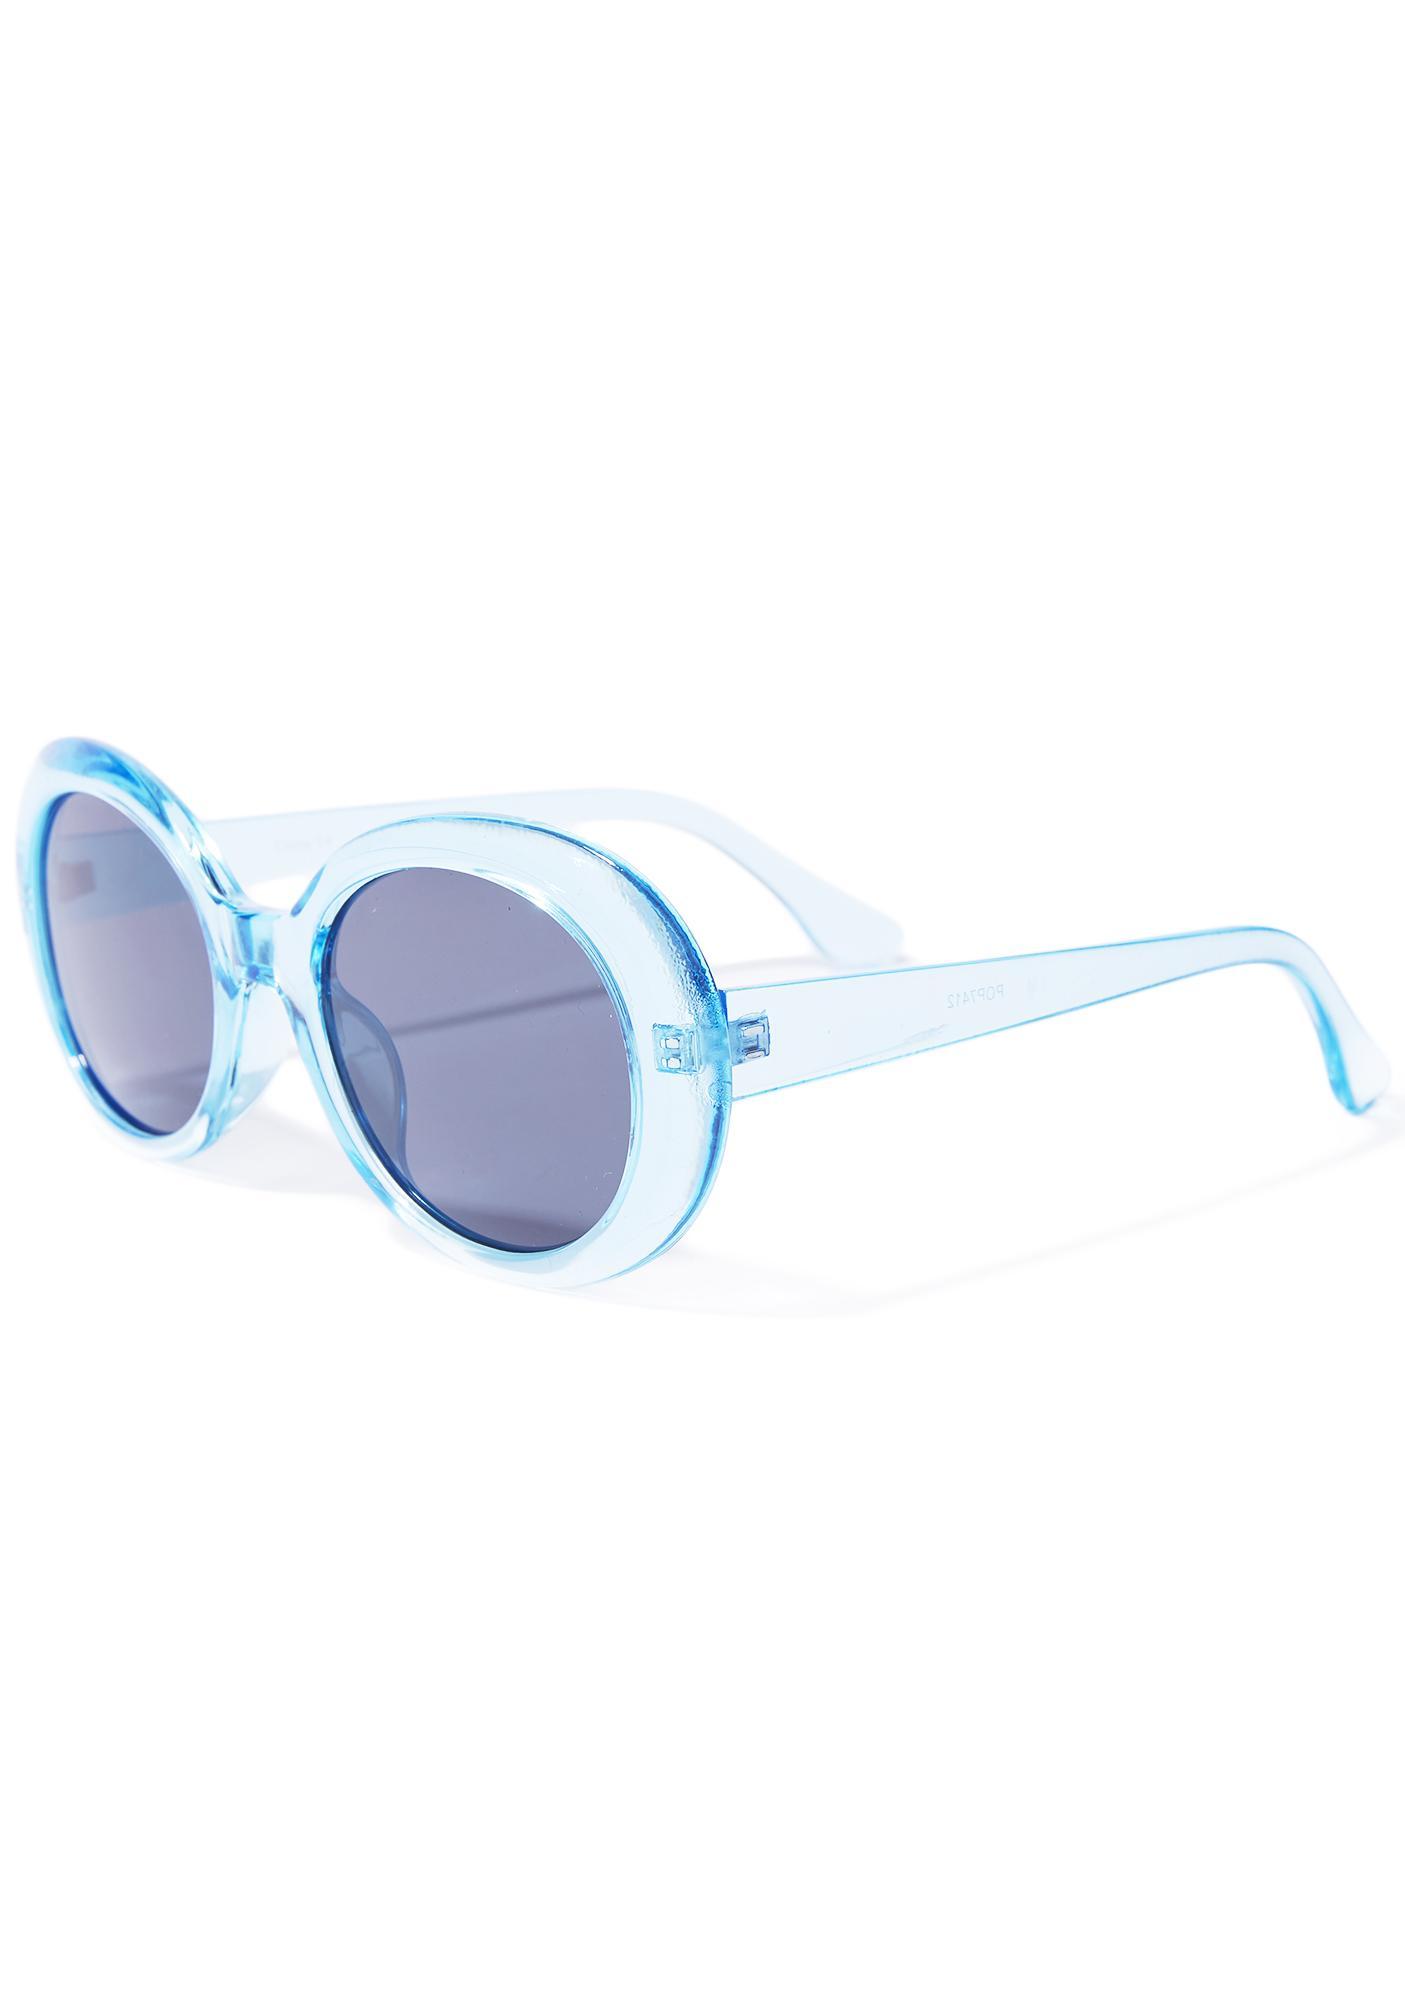 Sky Kurt Cobain Sunglasses